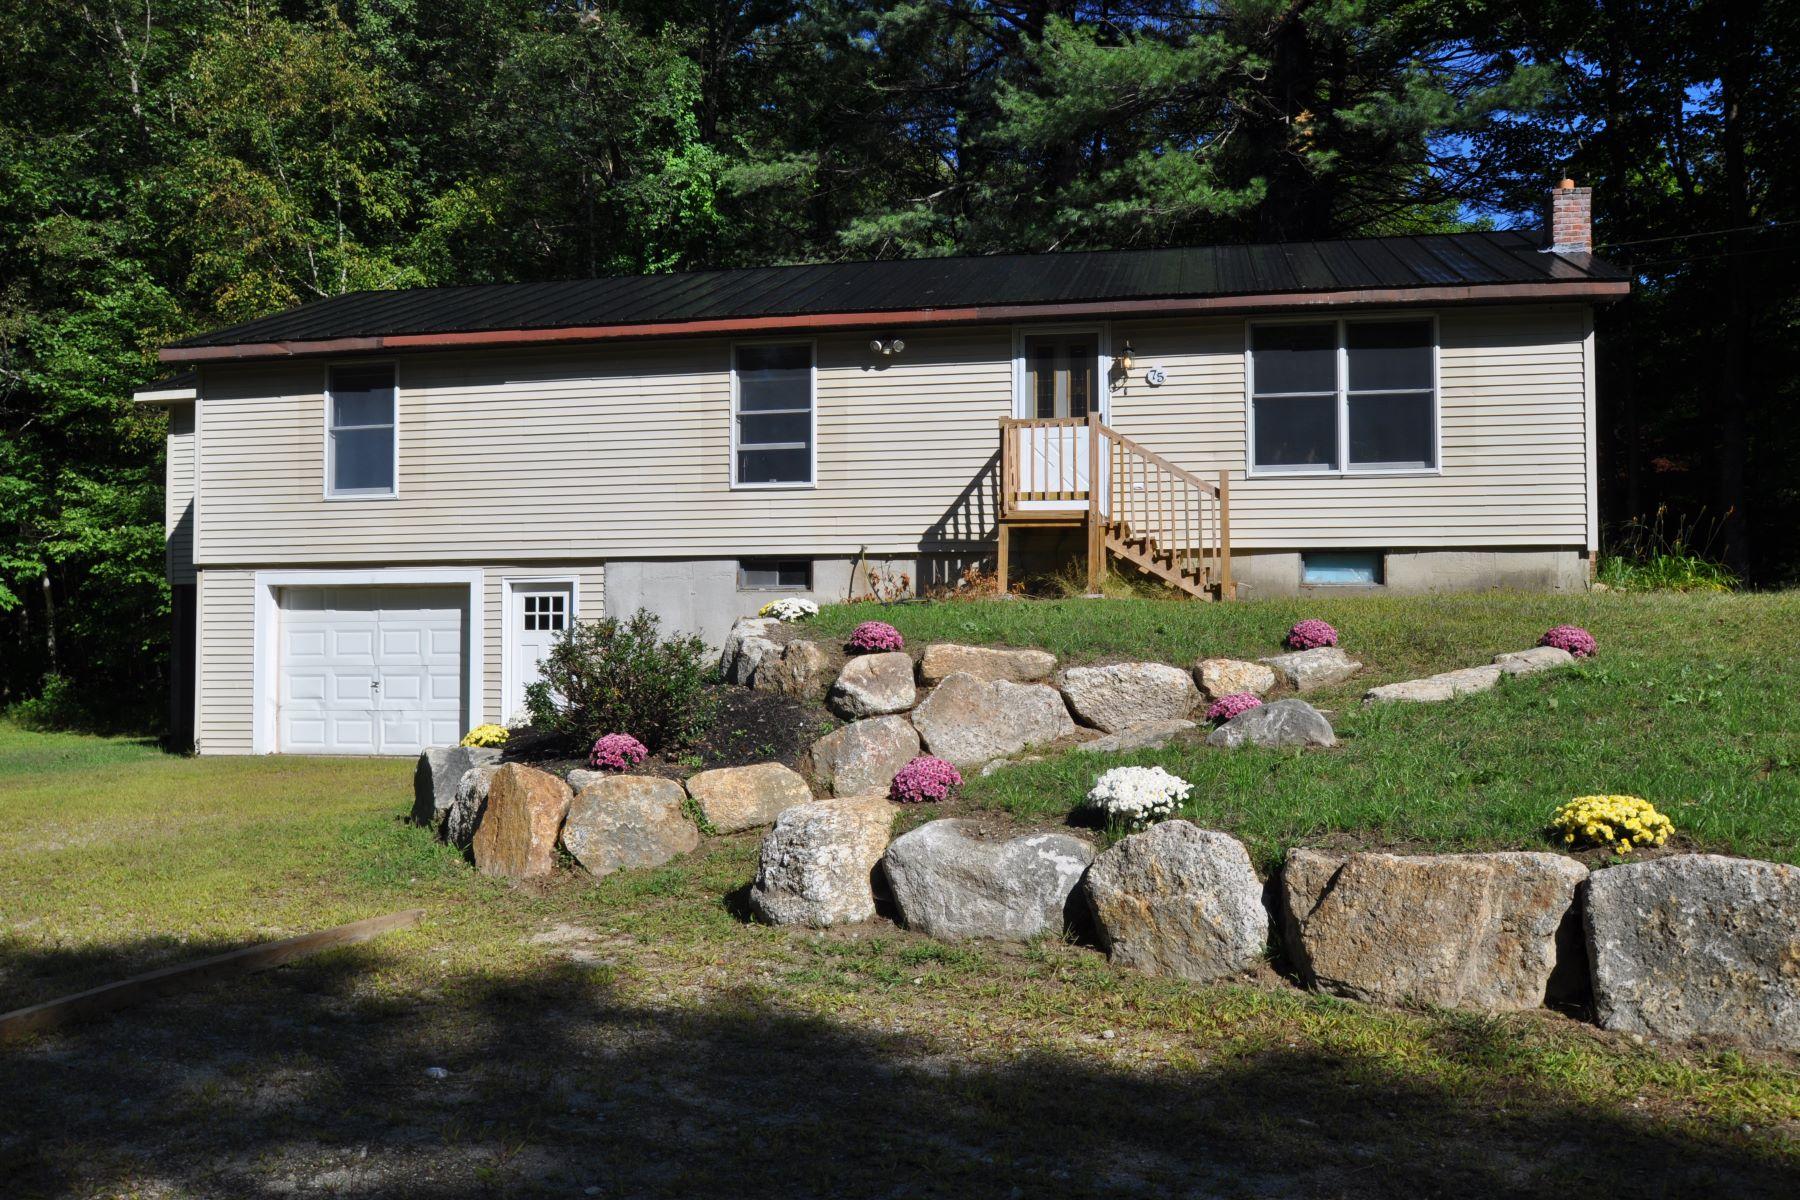 Single Family Homes 为 销售 在 75 Foothills Road, Sutton 75 Foothills Rd 萨顿, 新罕布什尔州 03273 美国